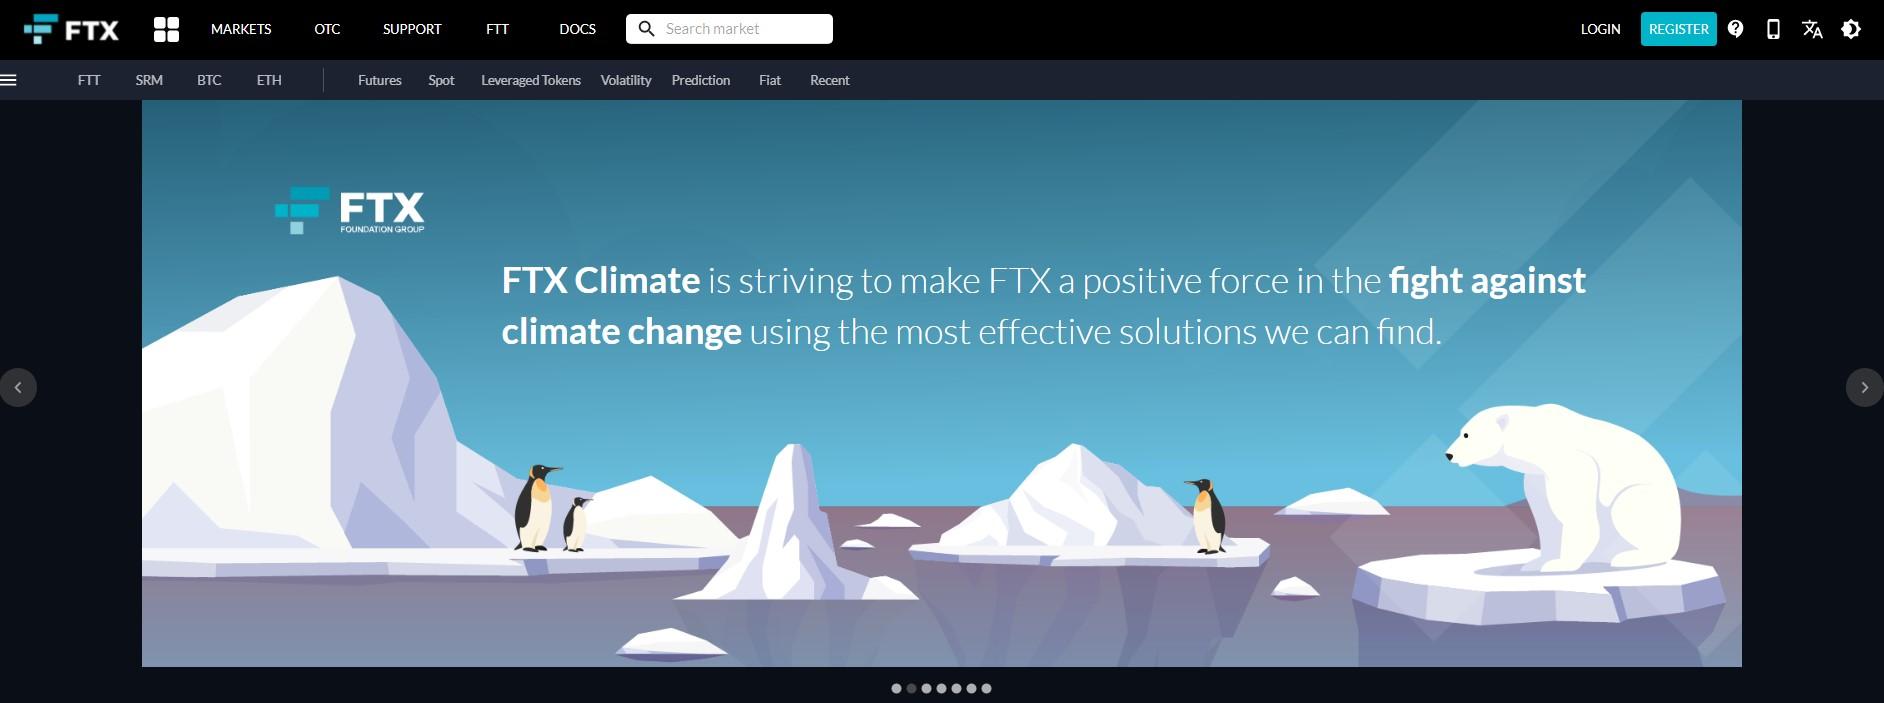 FTX homepage